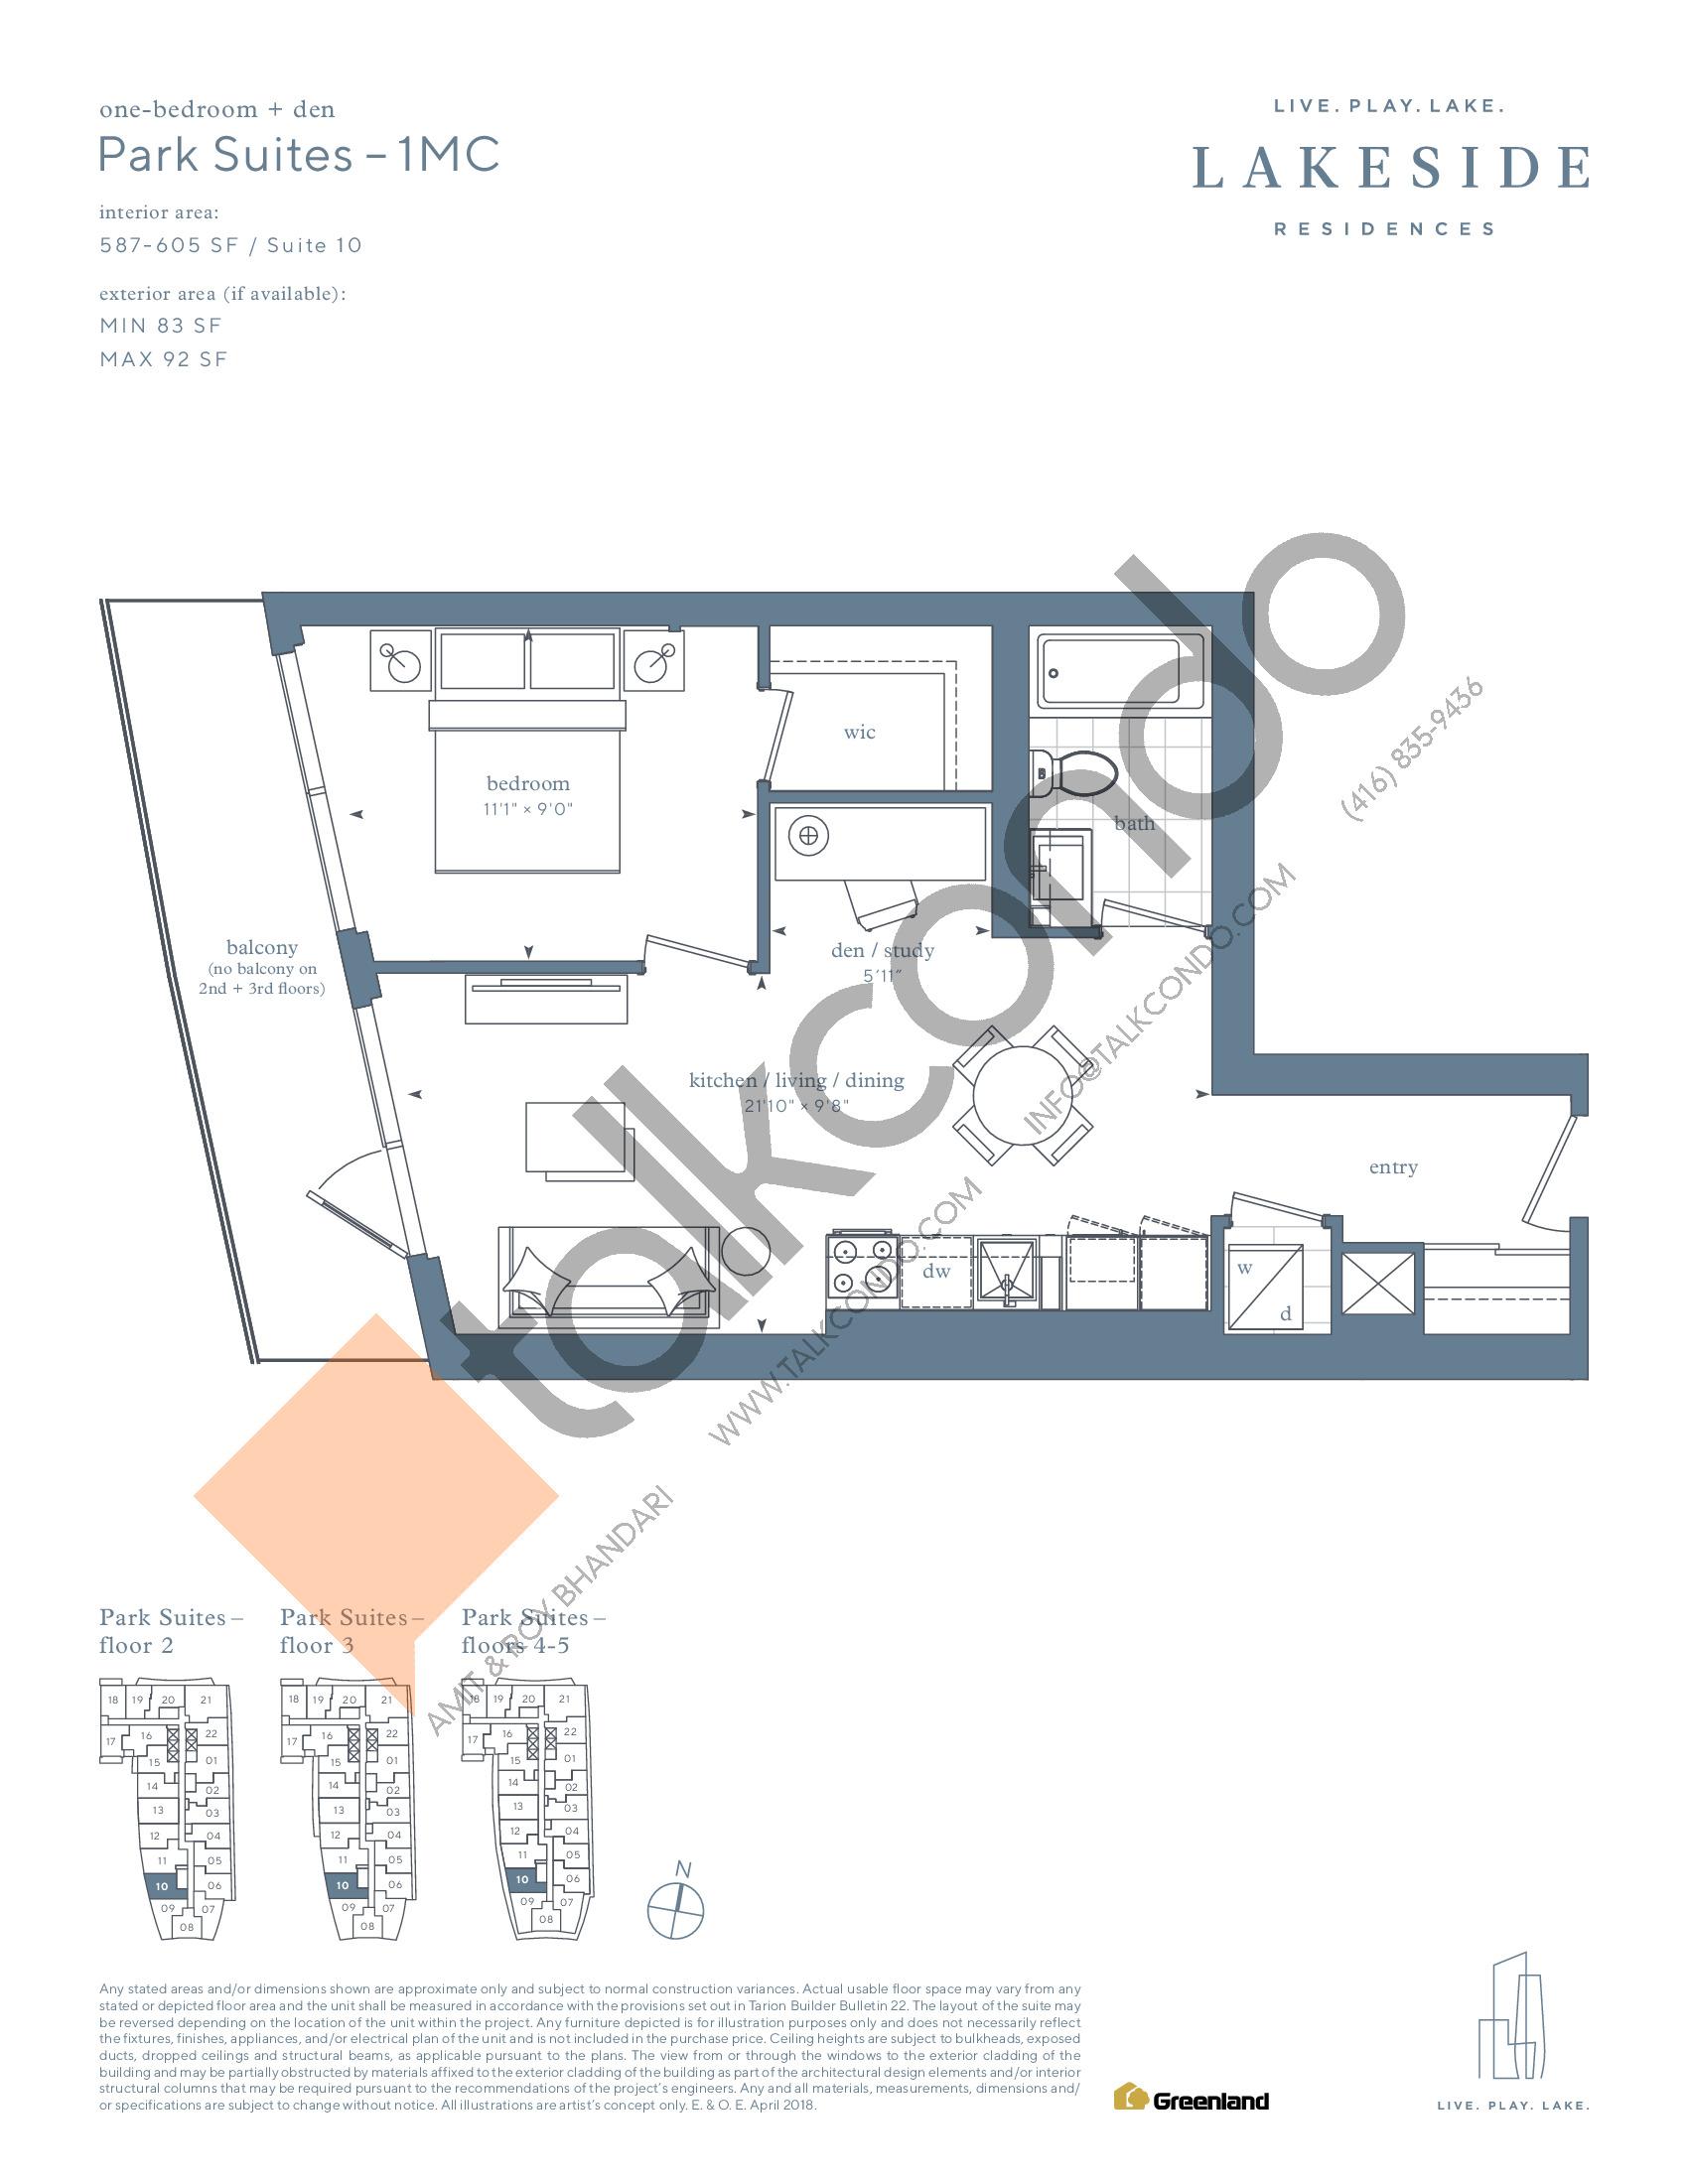 Park Suites - 1MC Floor Plan at Lakeside Residences - 605 sq.ft